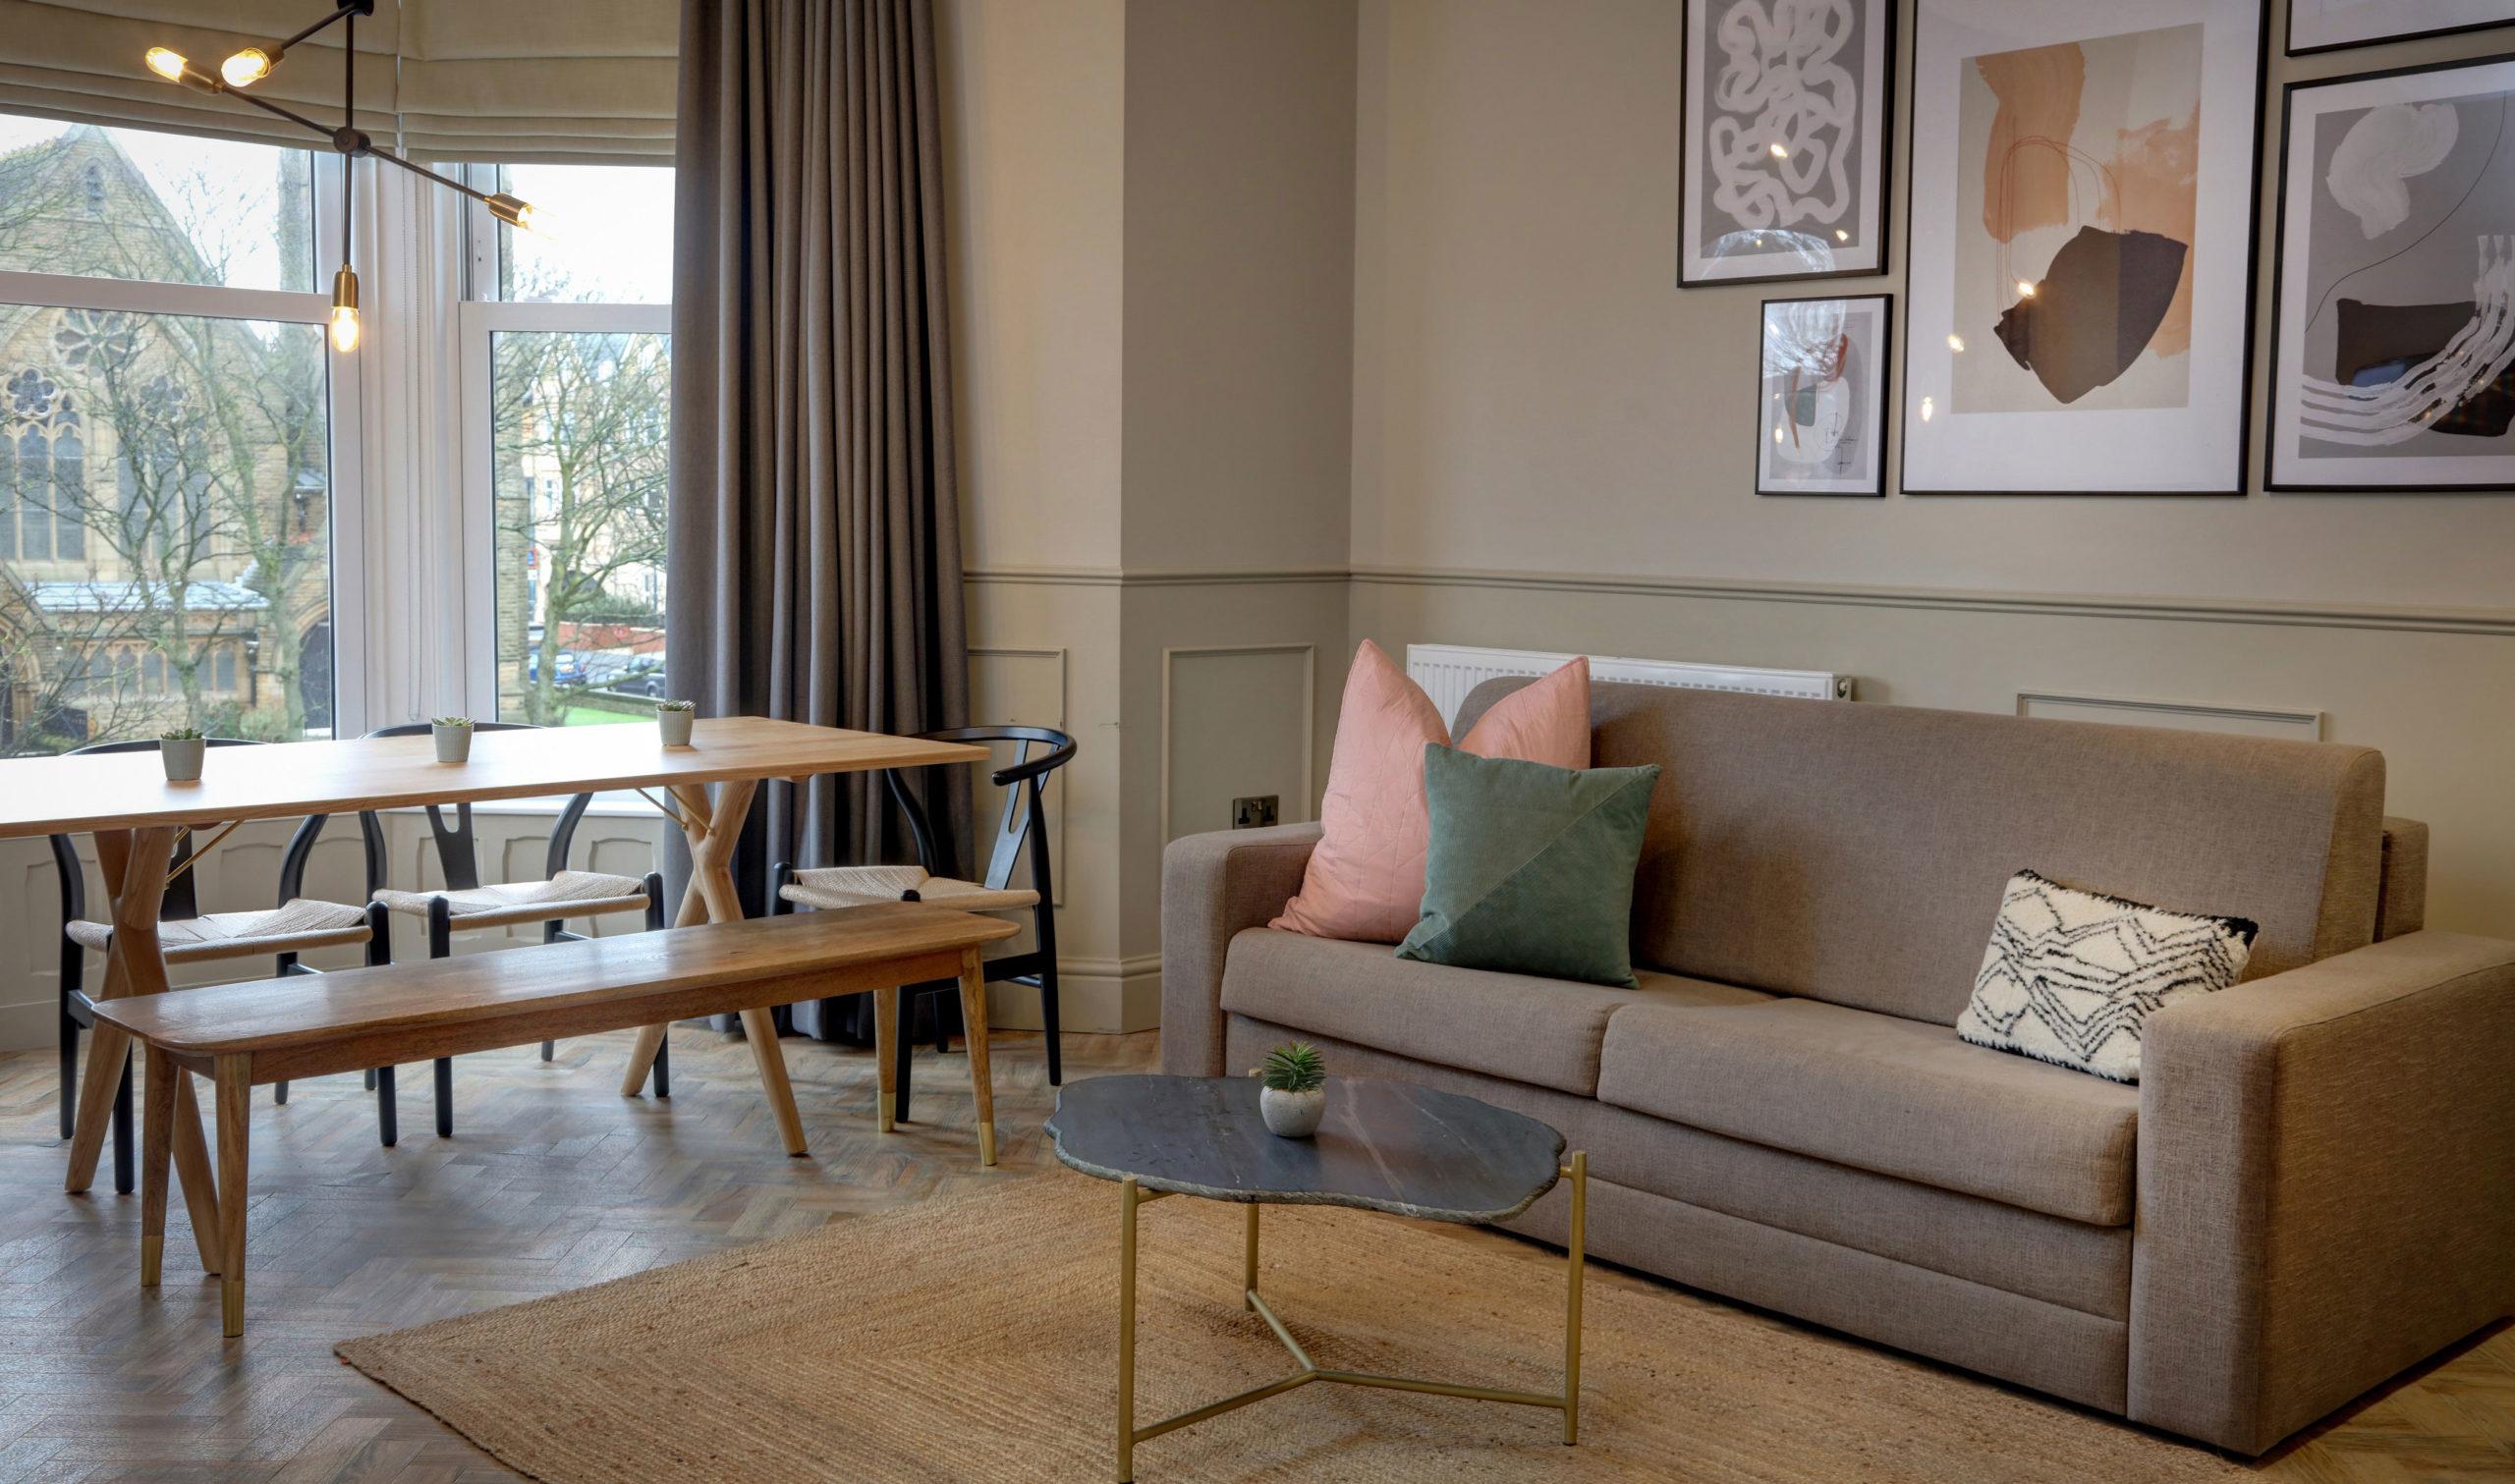 Aparthotel Lytham St Annes